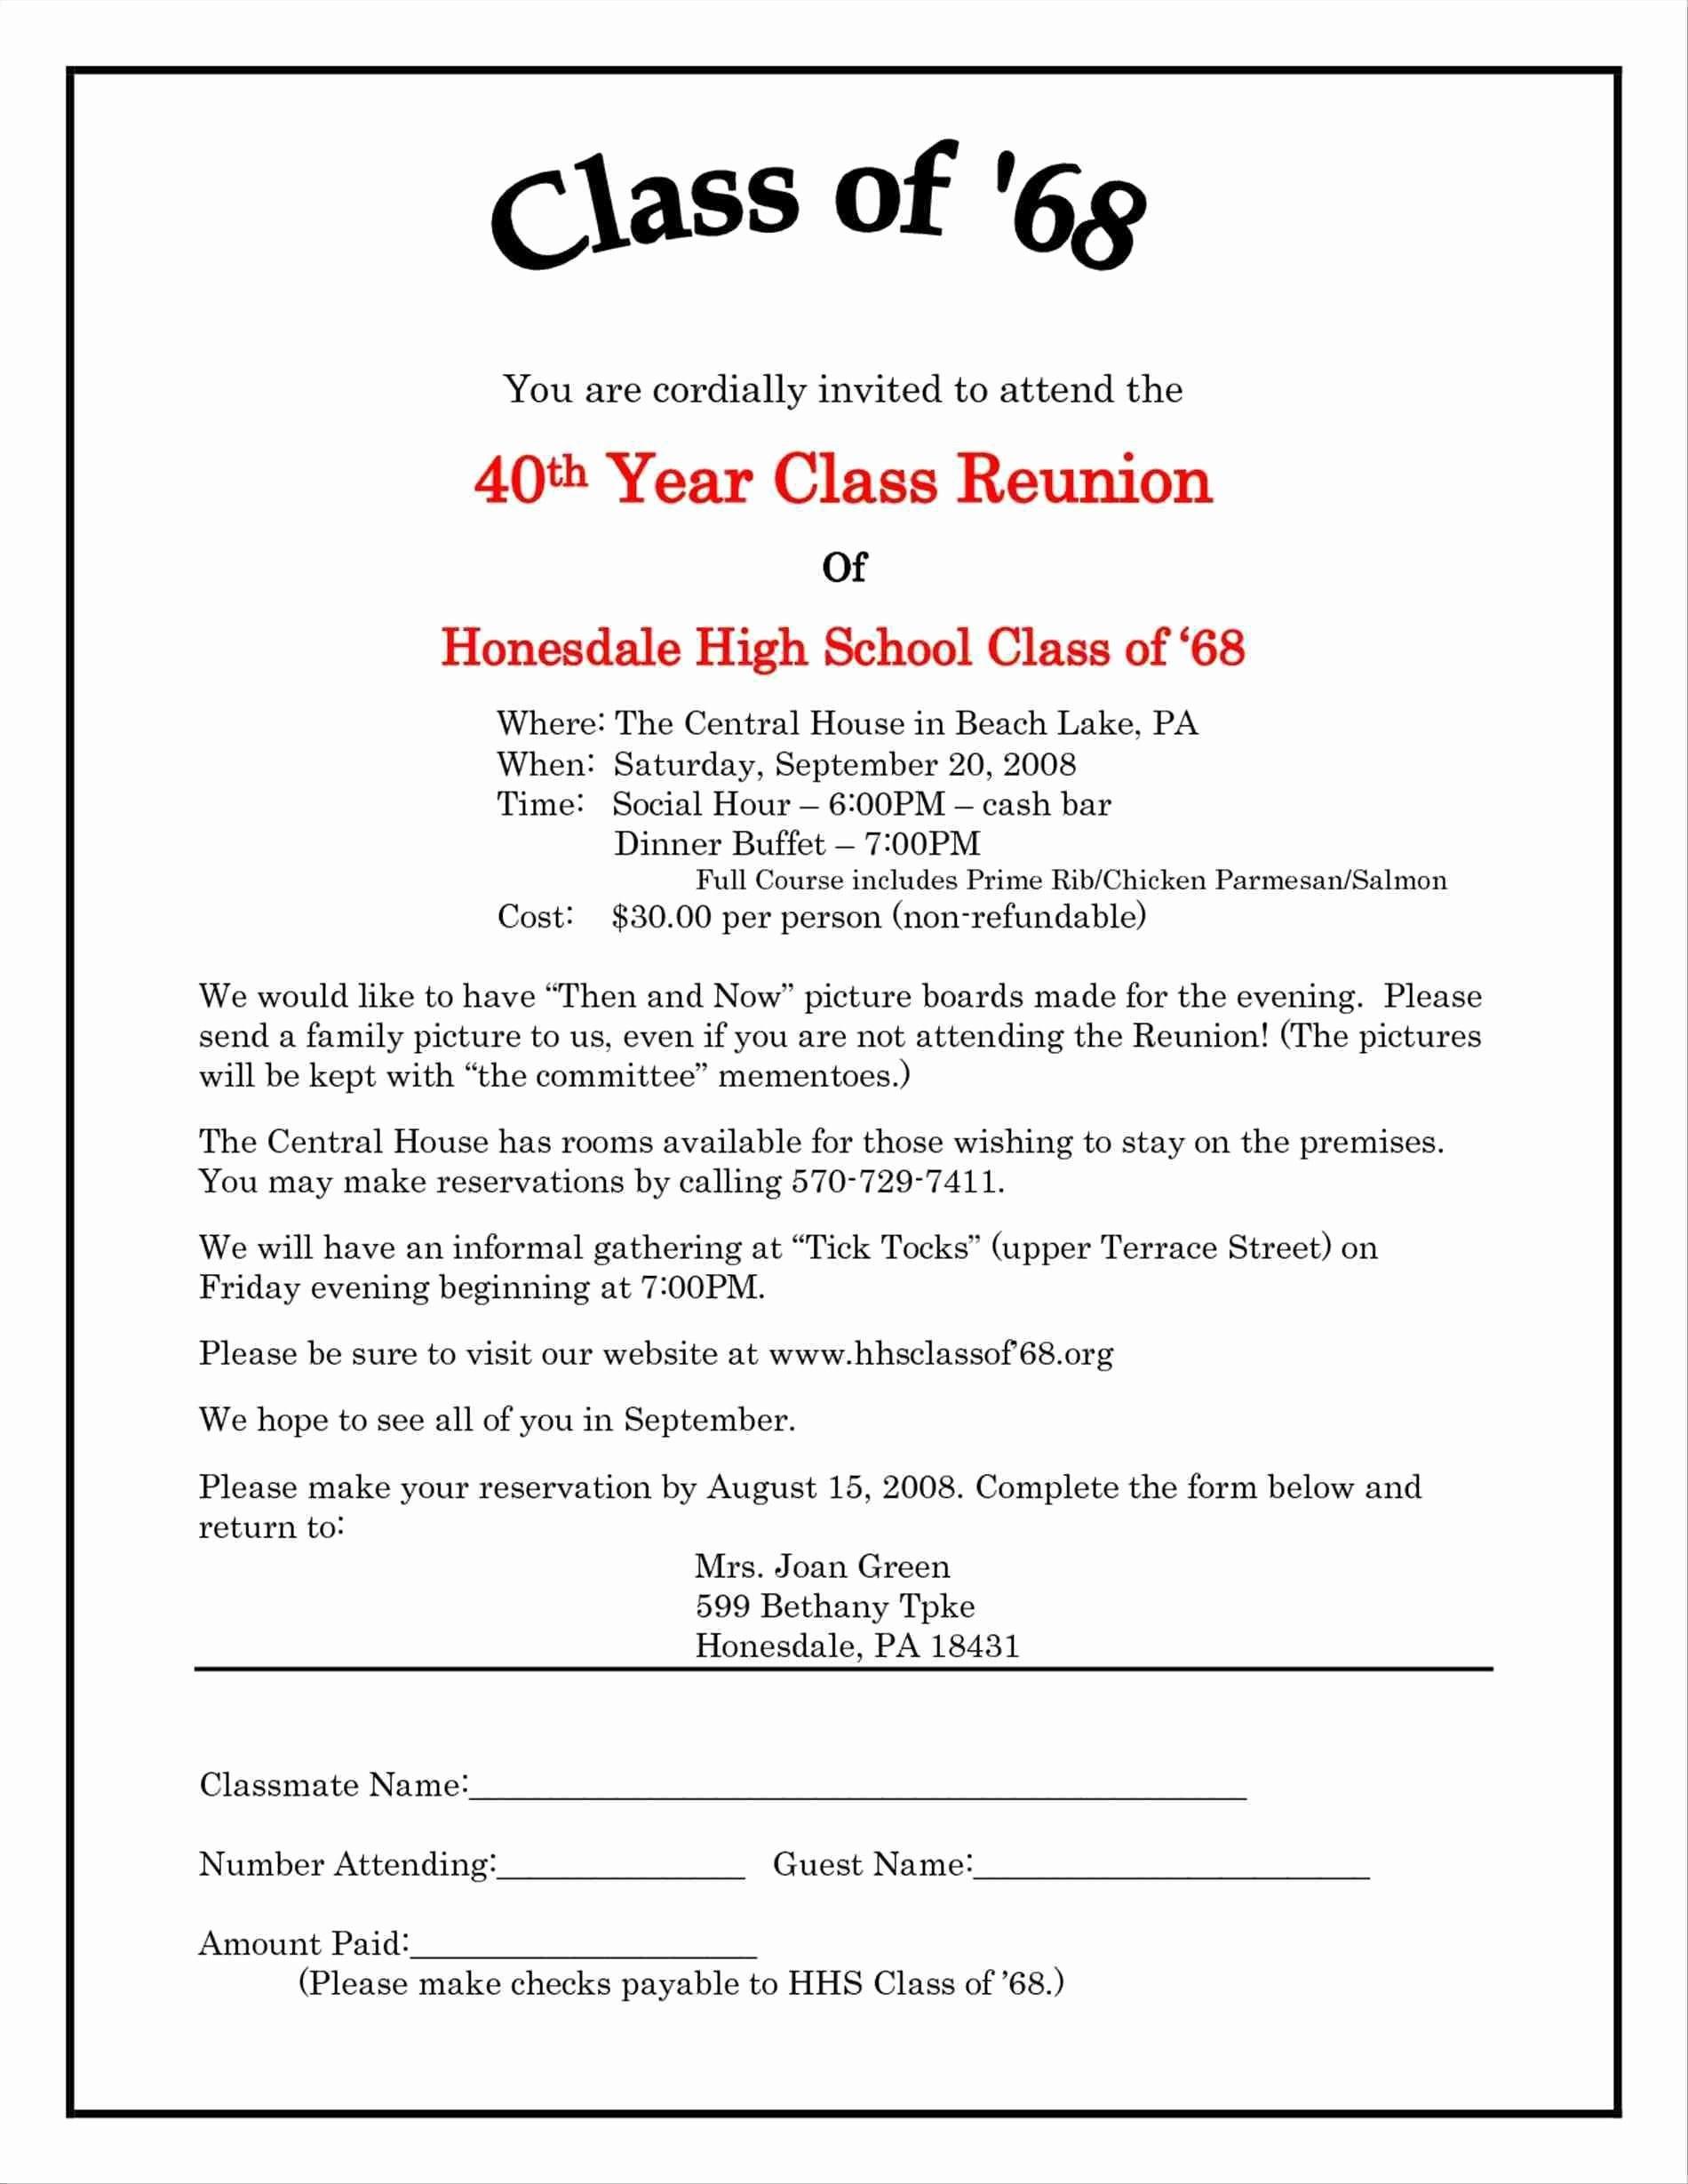 Class Reunion Invitation Template